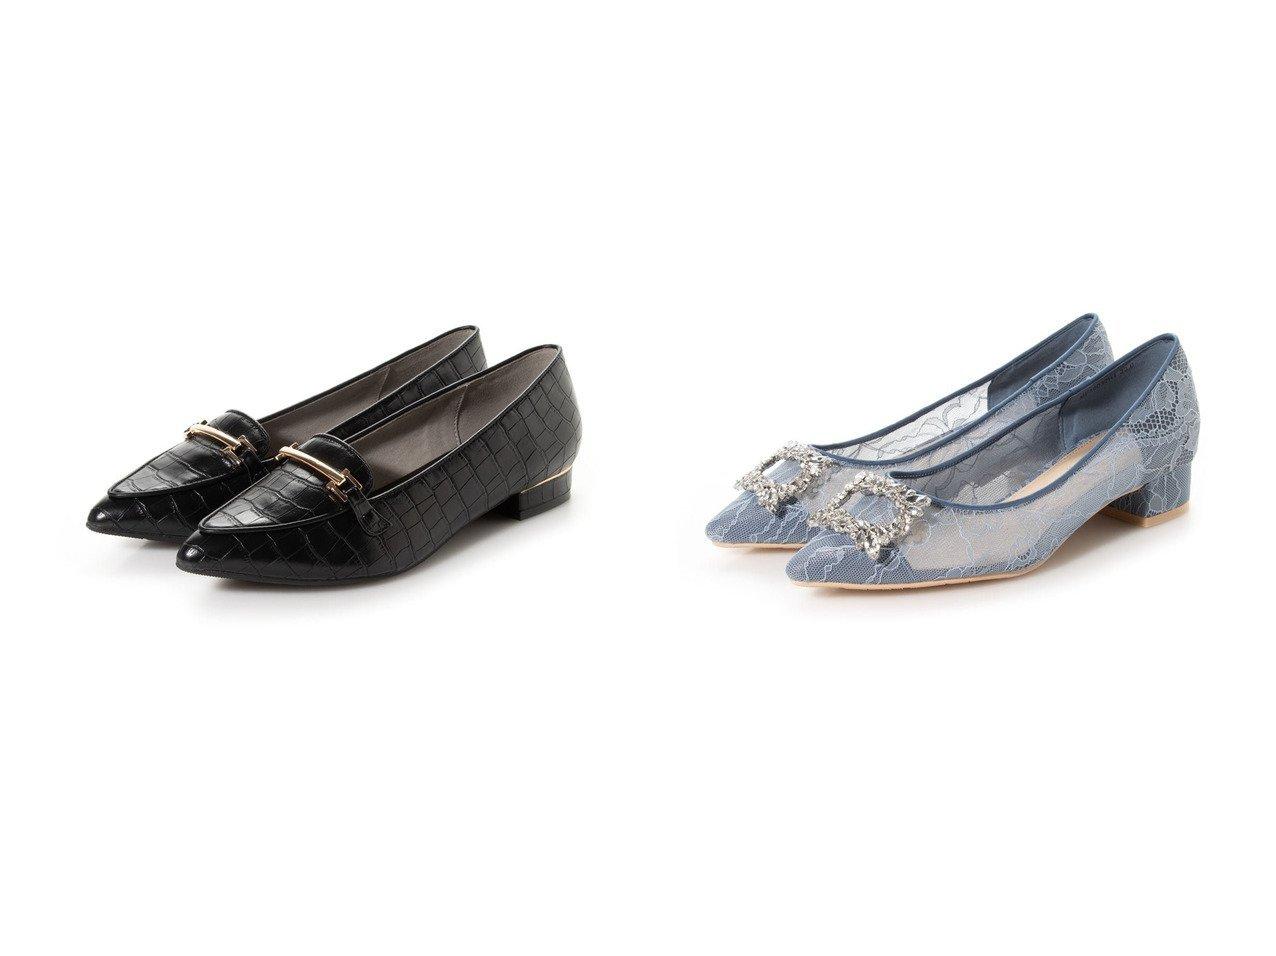 【RANDA/ランダ】の3E幅広 ポインテッドトゥビットパーツフラットシューズ&ソフト レースメッシュビジューバックルパンプス RANDAのおすすめ!人気、トレンド・レディースファッションの通販 おすすめで人気の流行・トレンド、ファッションの通販商品 メンズファッション・キッズファッション・インテリア・家具・レディースファッション・服の通販 founy(ファニー) https://founy.com/ ファッション Fashion レディースファッション WOMEN バッグ Bag 2021年 2021 2021 春夏 S/S SS Spring/Summer 2021 S/S 春夏 SS Spring/Summer シューズ フラット 春 Spring  ID:crp329100000019972